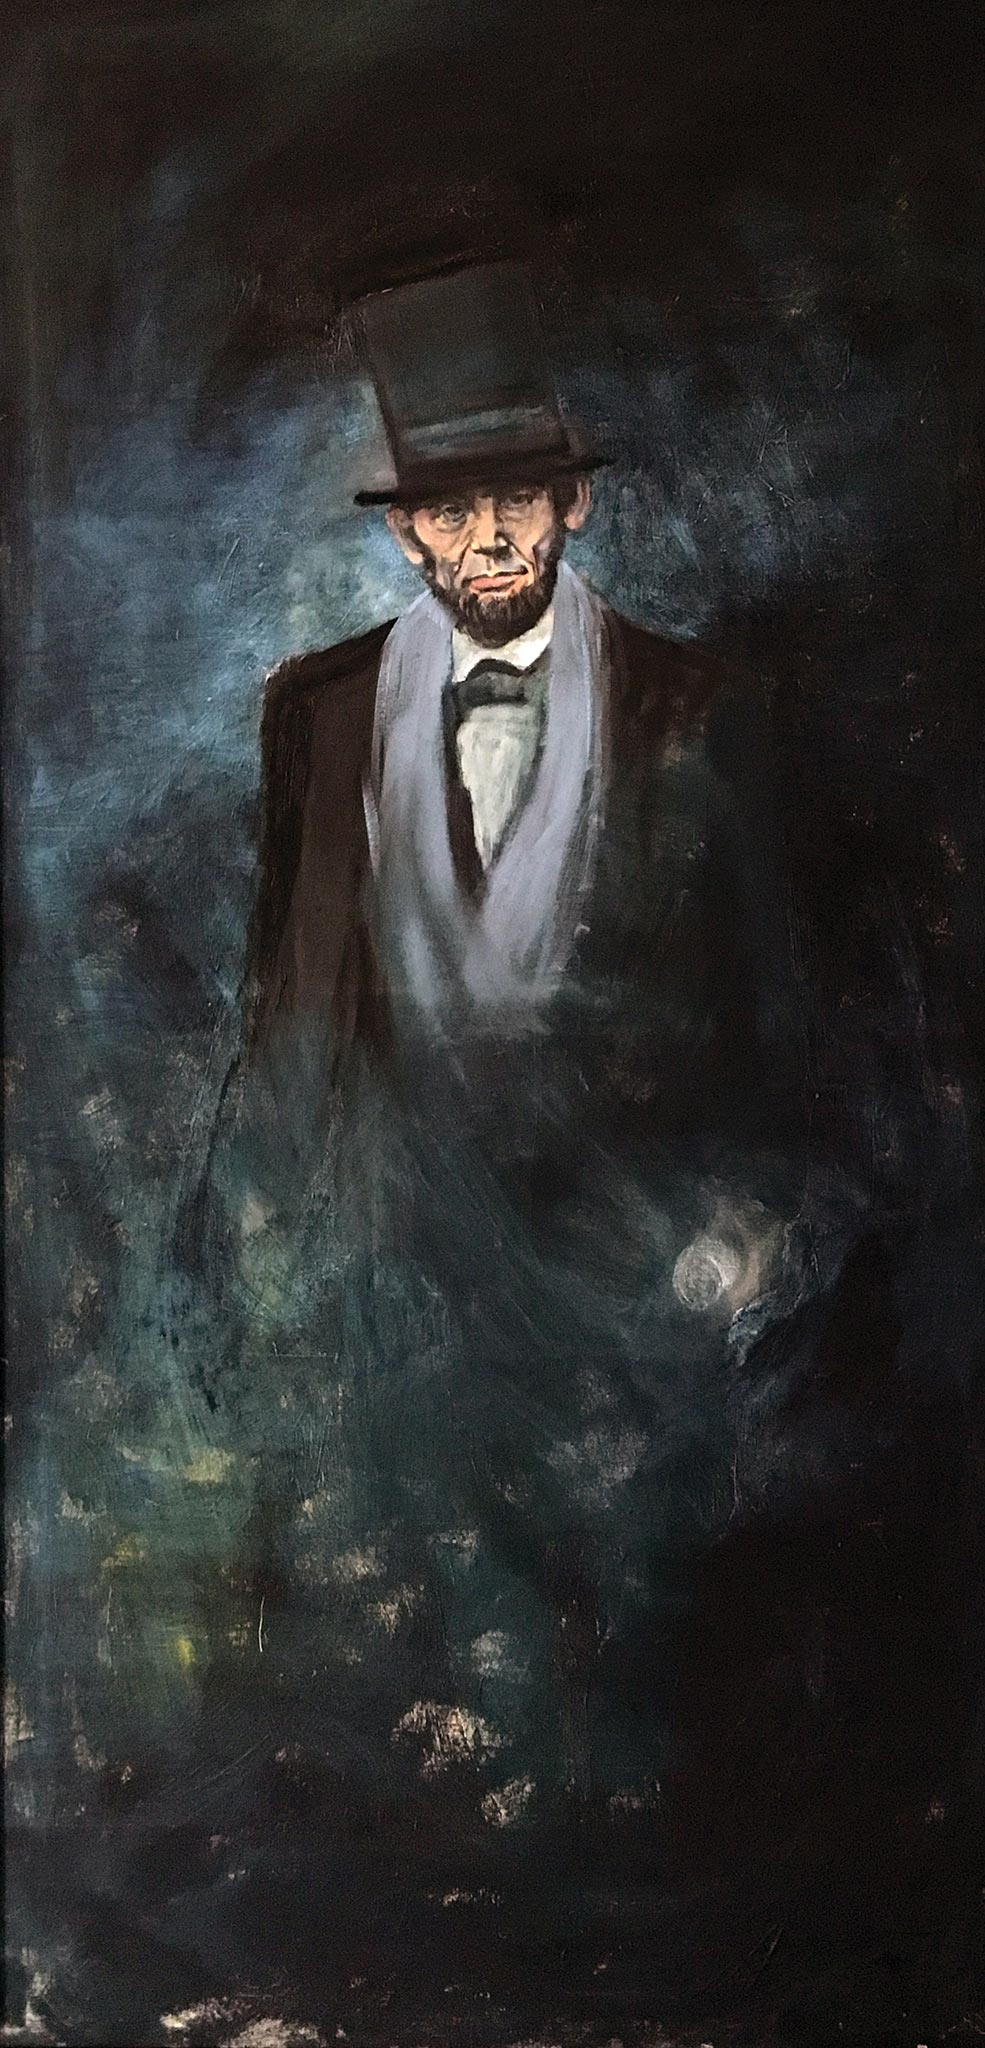 Lincoln 219, Wendy Allen, Oil on Canvas